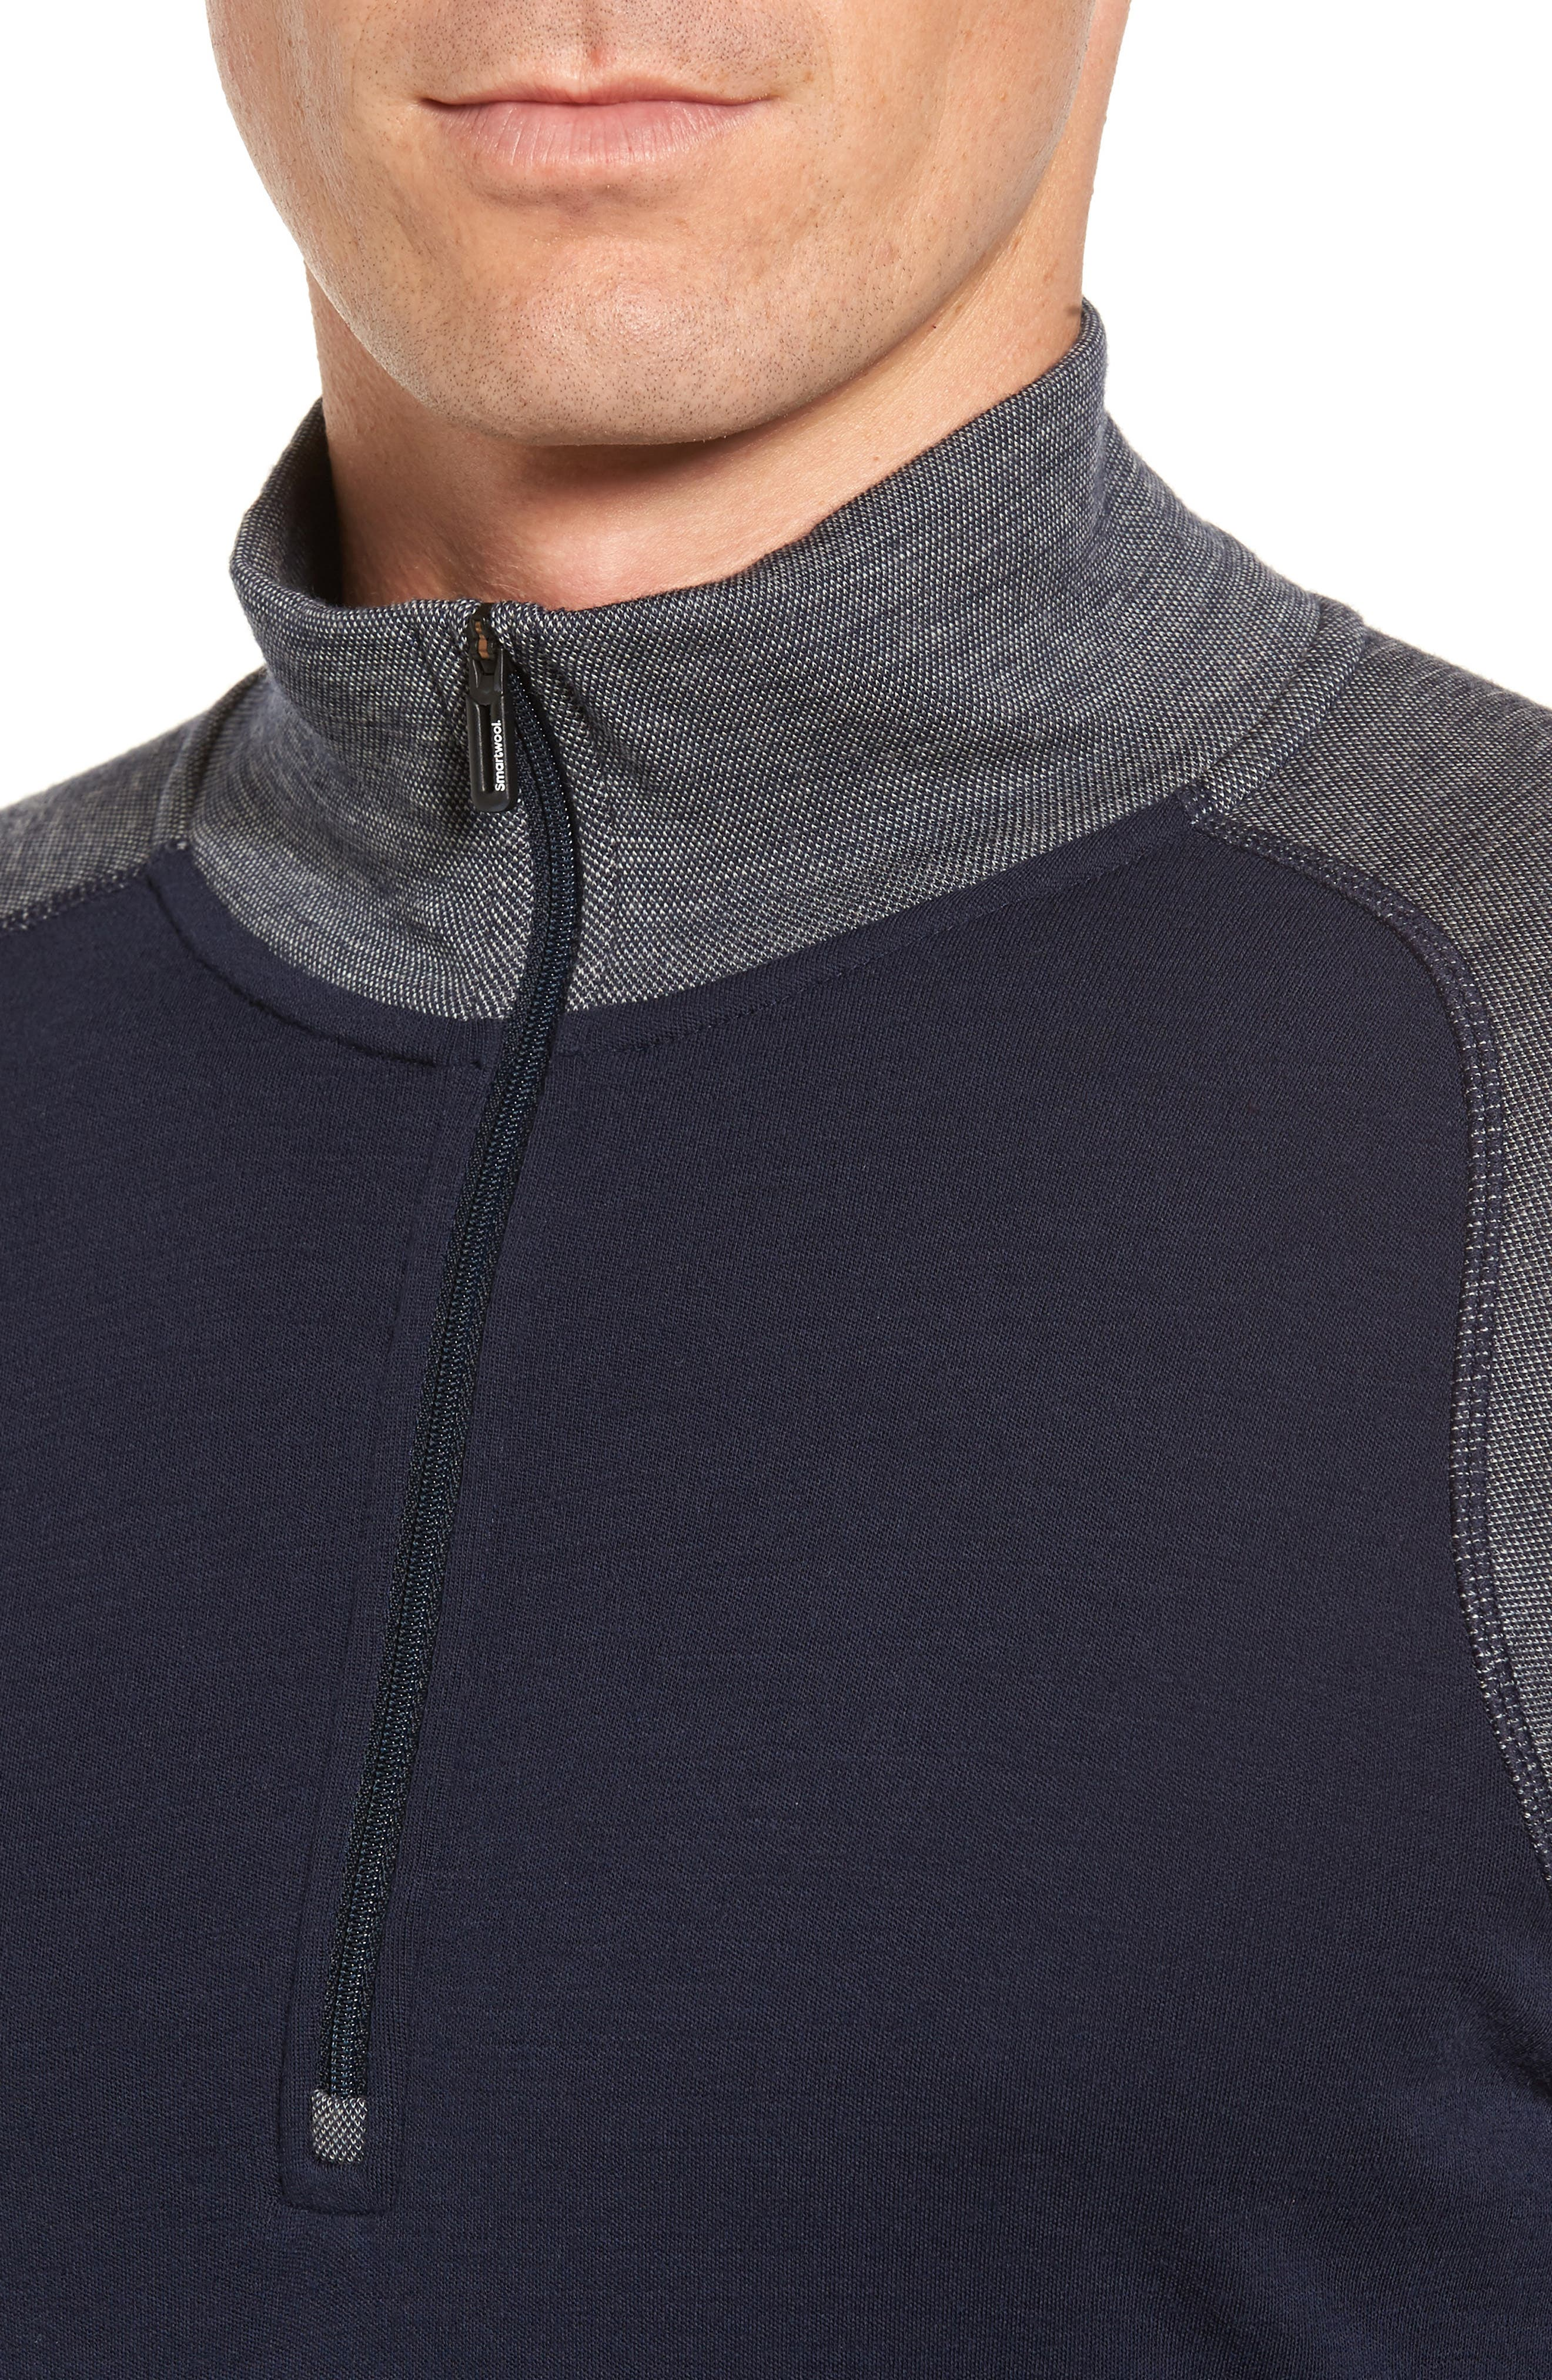 Merino 250 Base Layer Pattern Quarter Zip Pullover,                             Alternate thumbnail 4, color,                             410